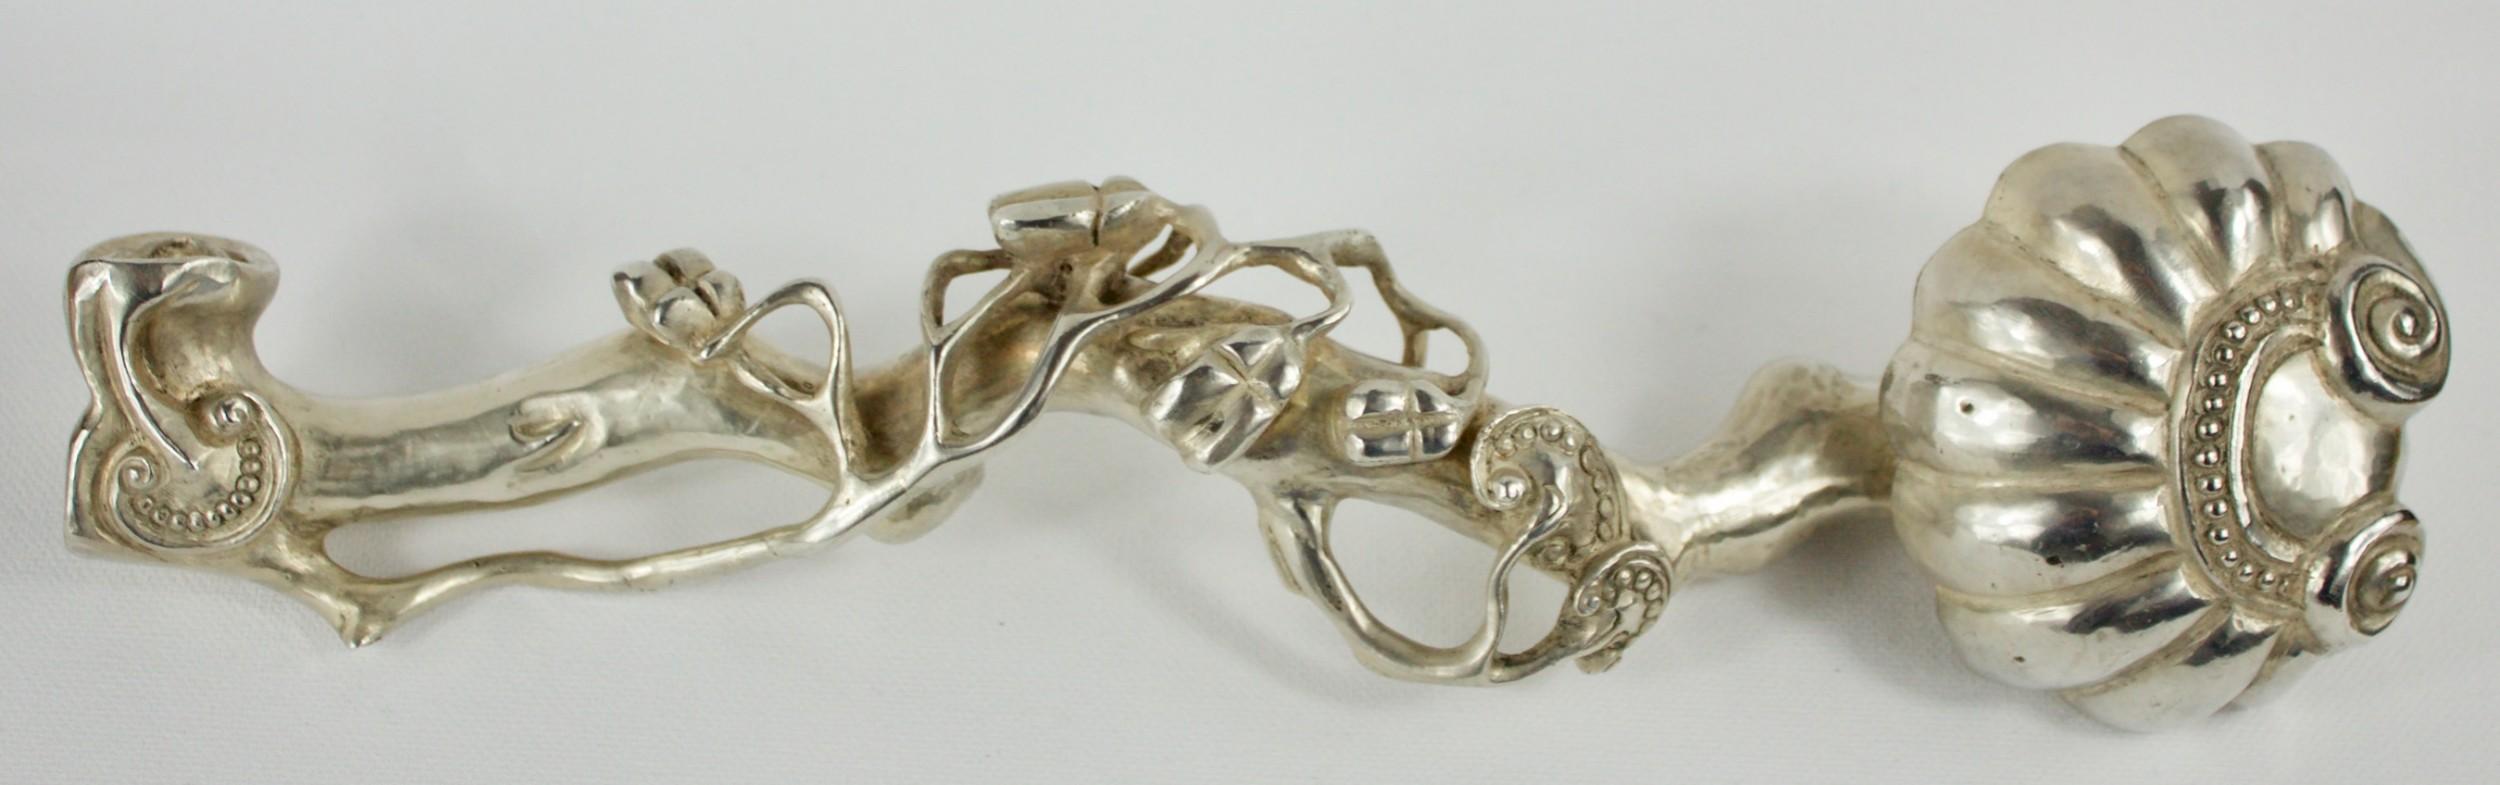 chinese silver ruyi sceptre